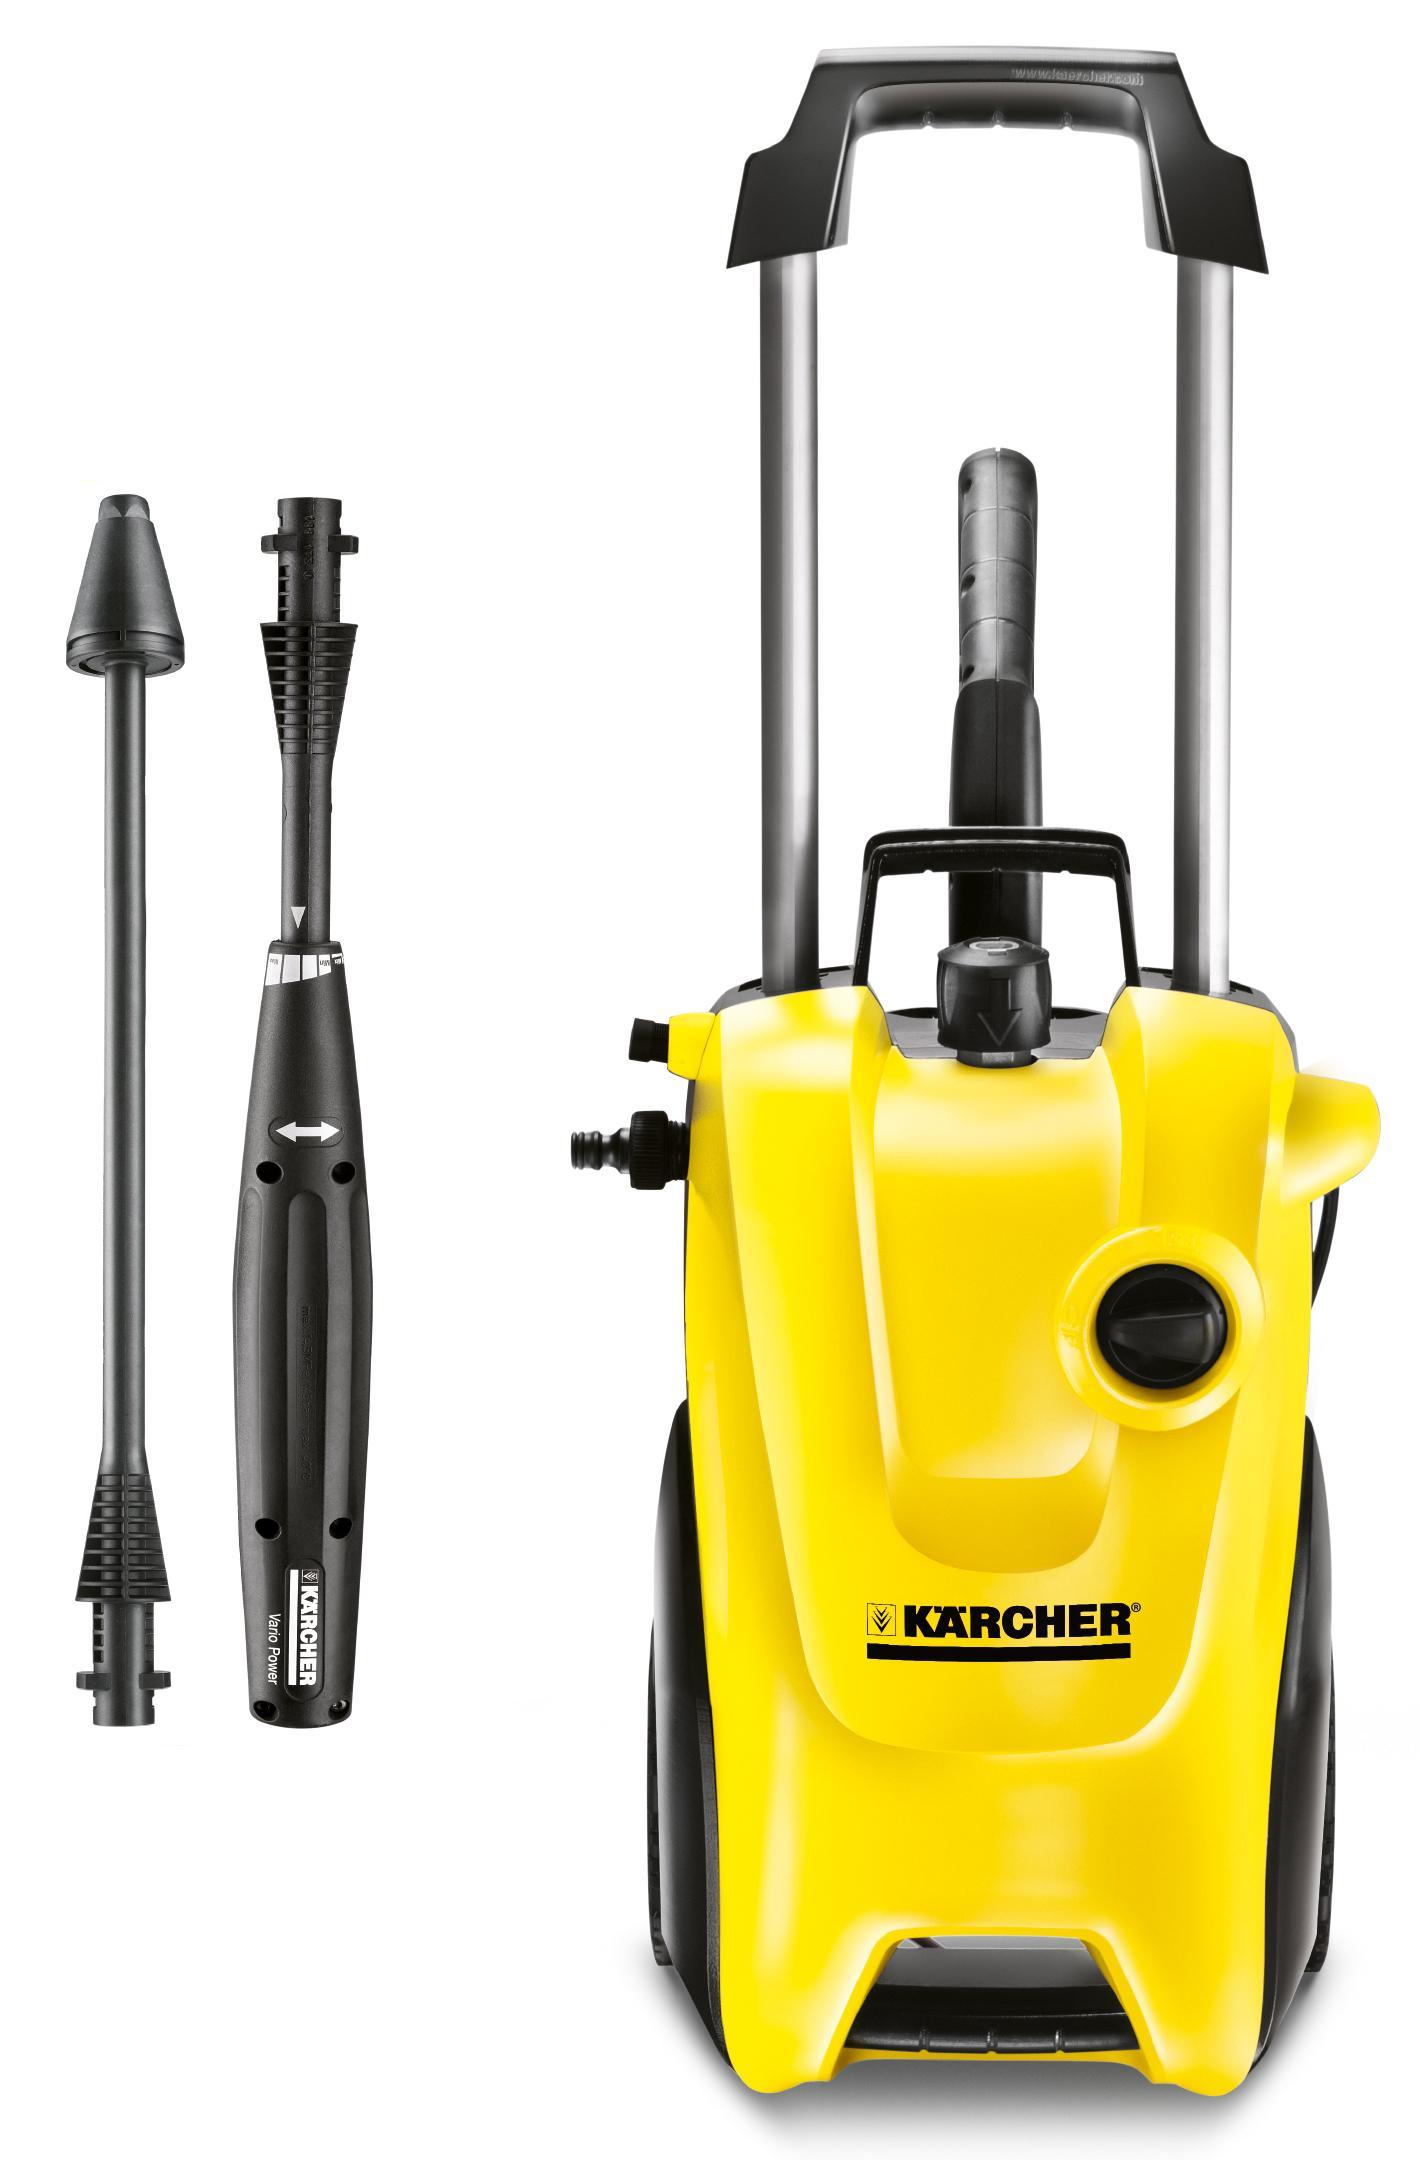 Karcher - K4 Compact Pressure Washer - 1800W lowest price